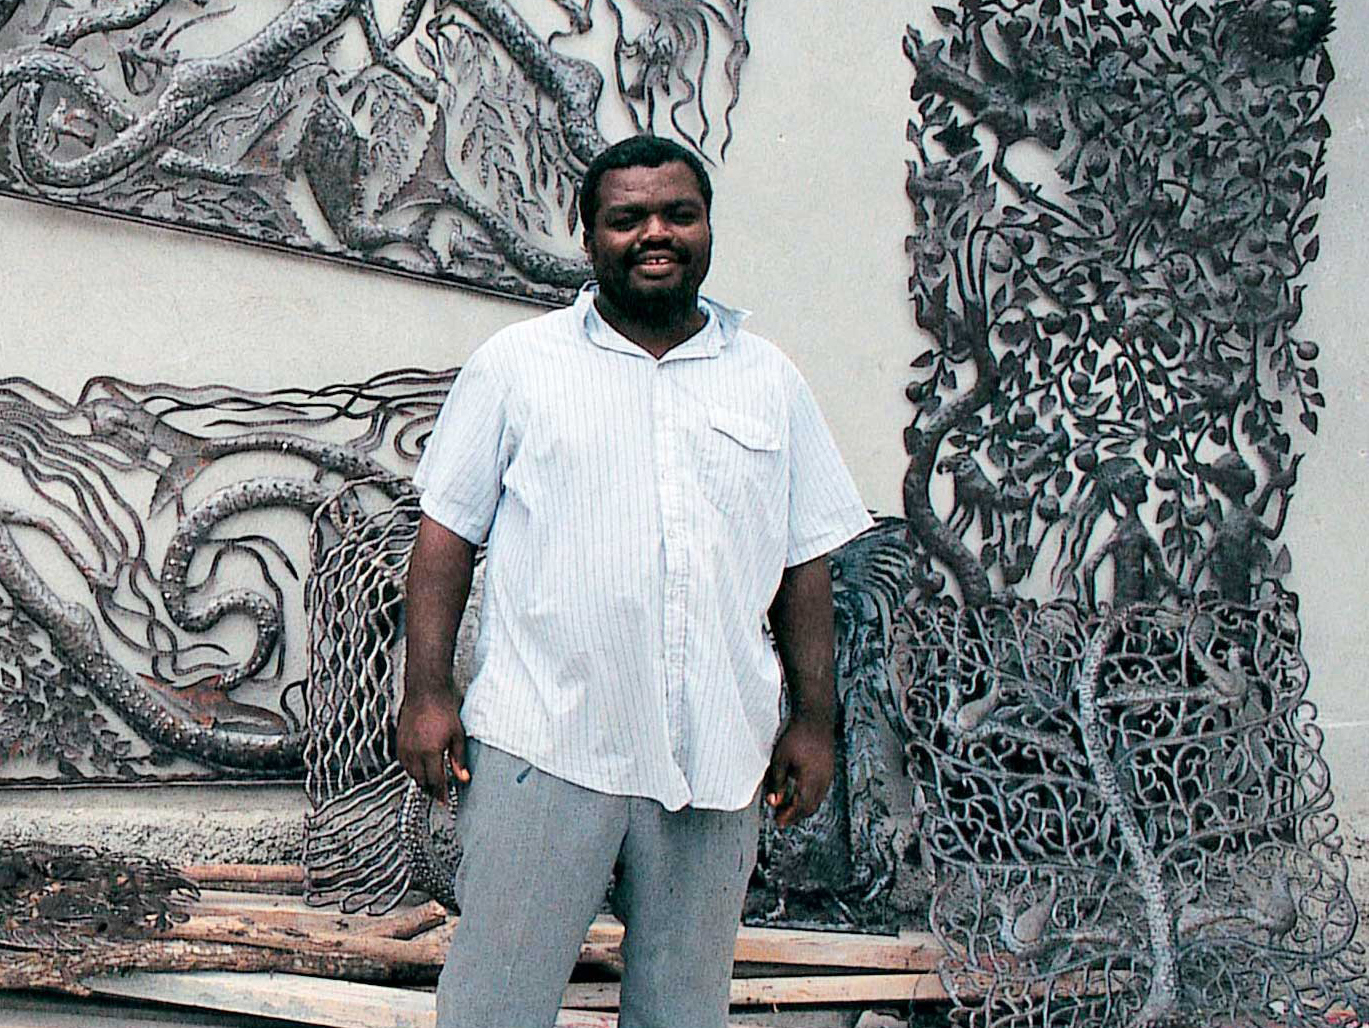 Cut Metal Wall Hanging - Haitian Artisan, Remy #LiveLifeFair #TenThousandVillages #FairTrade